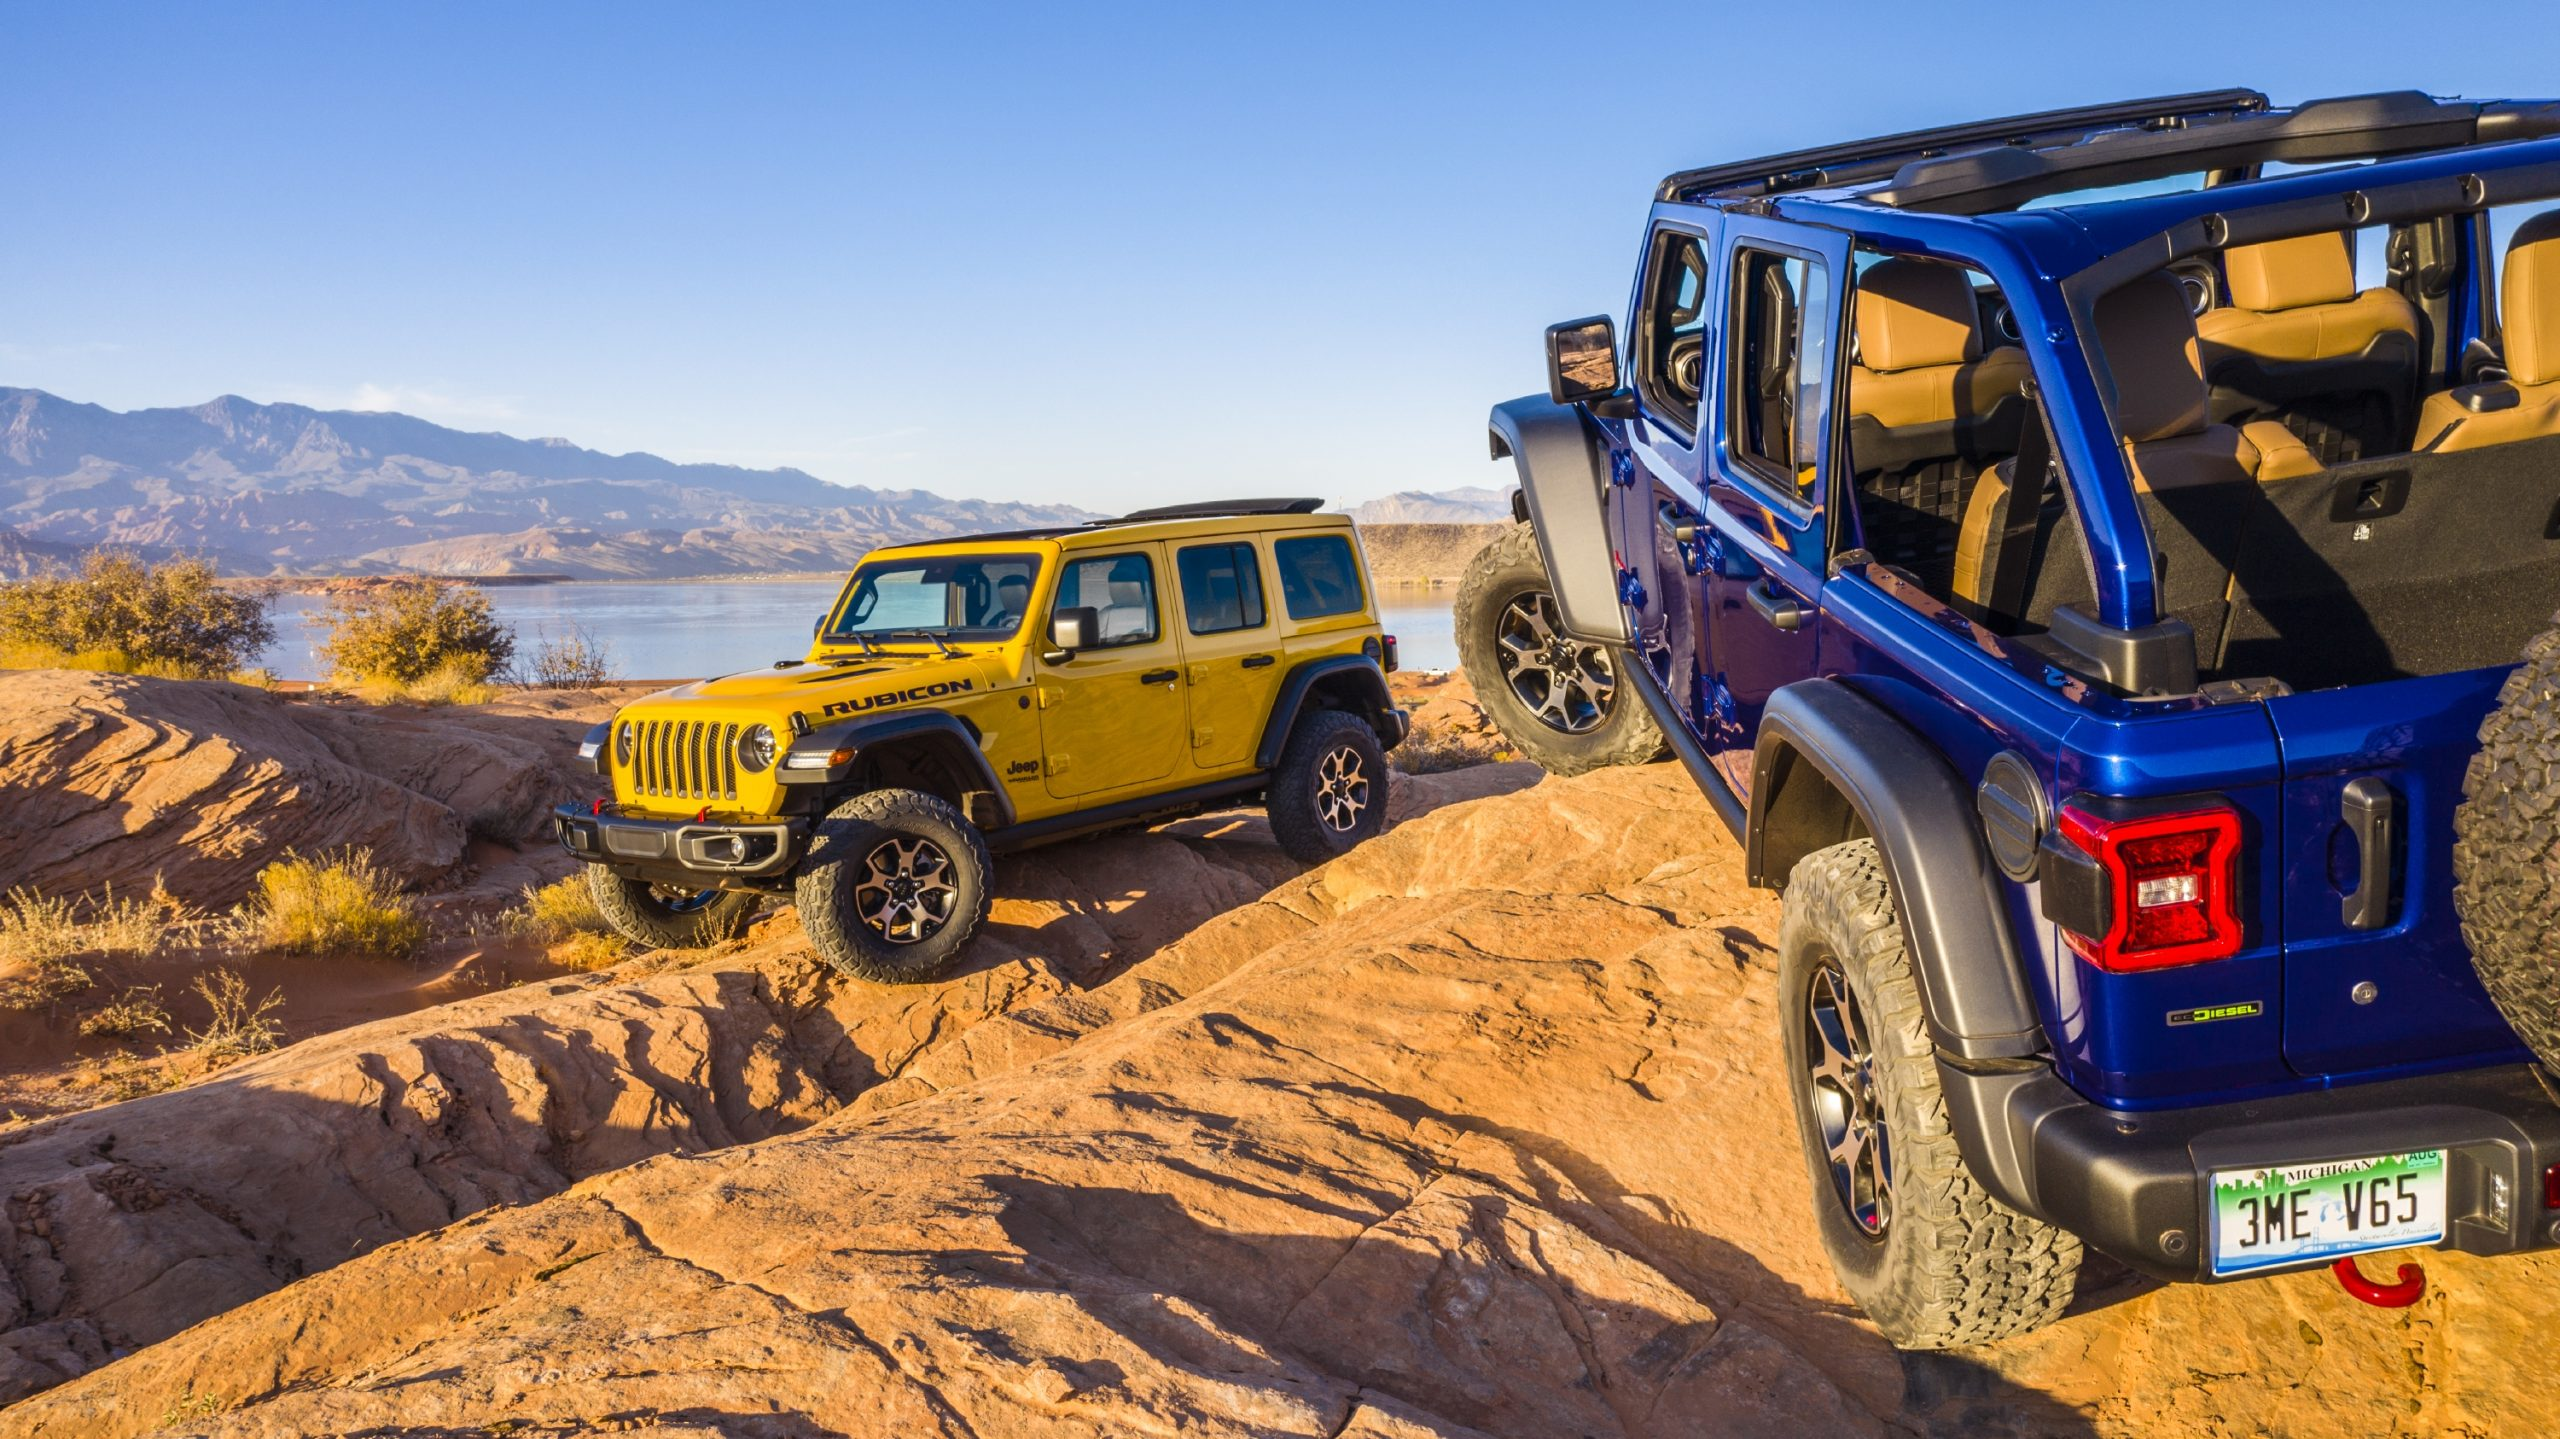 2021 Jeep® Wrangler Rubicon EcoDiesel